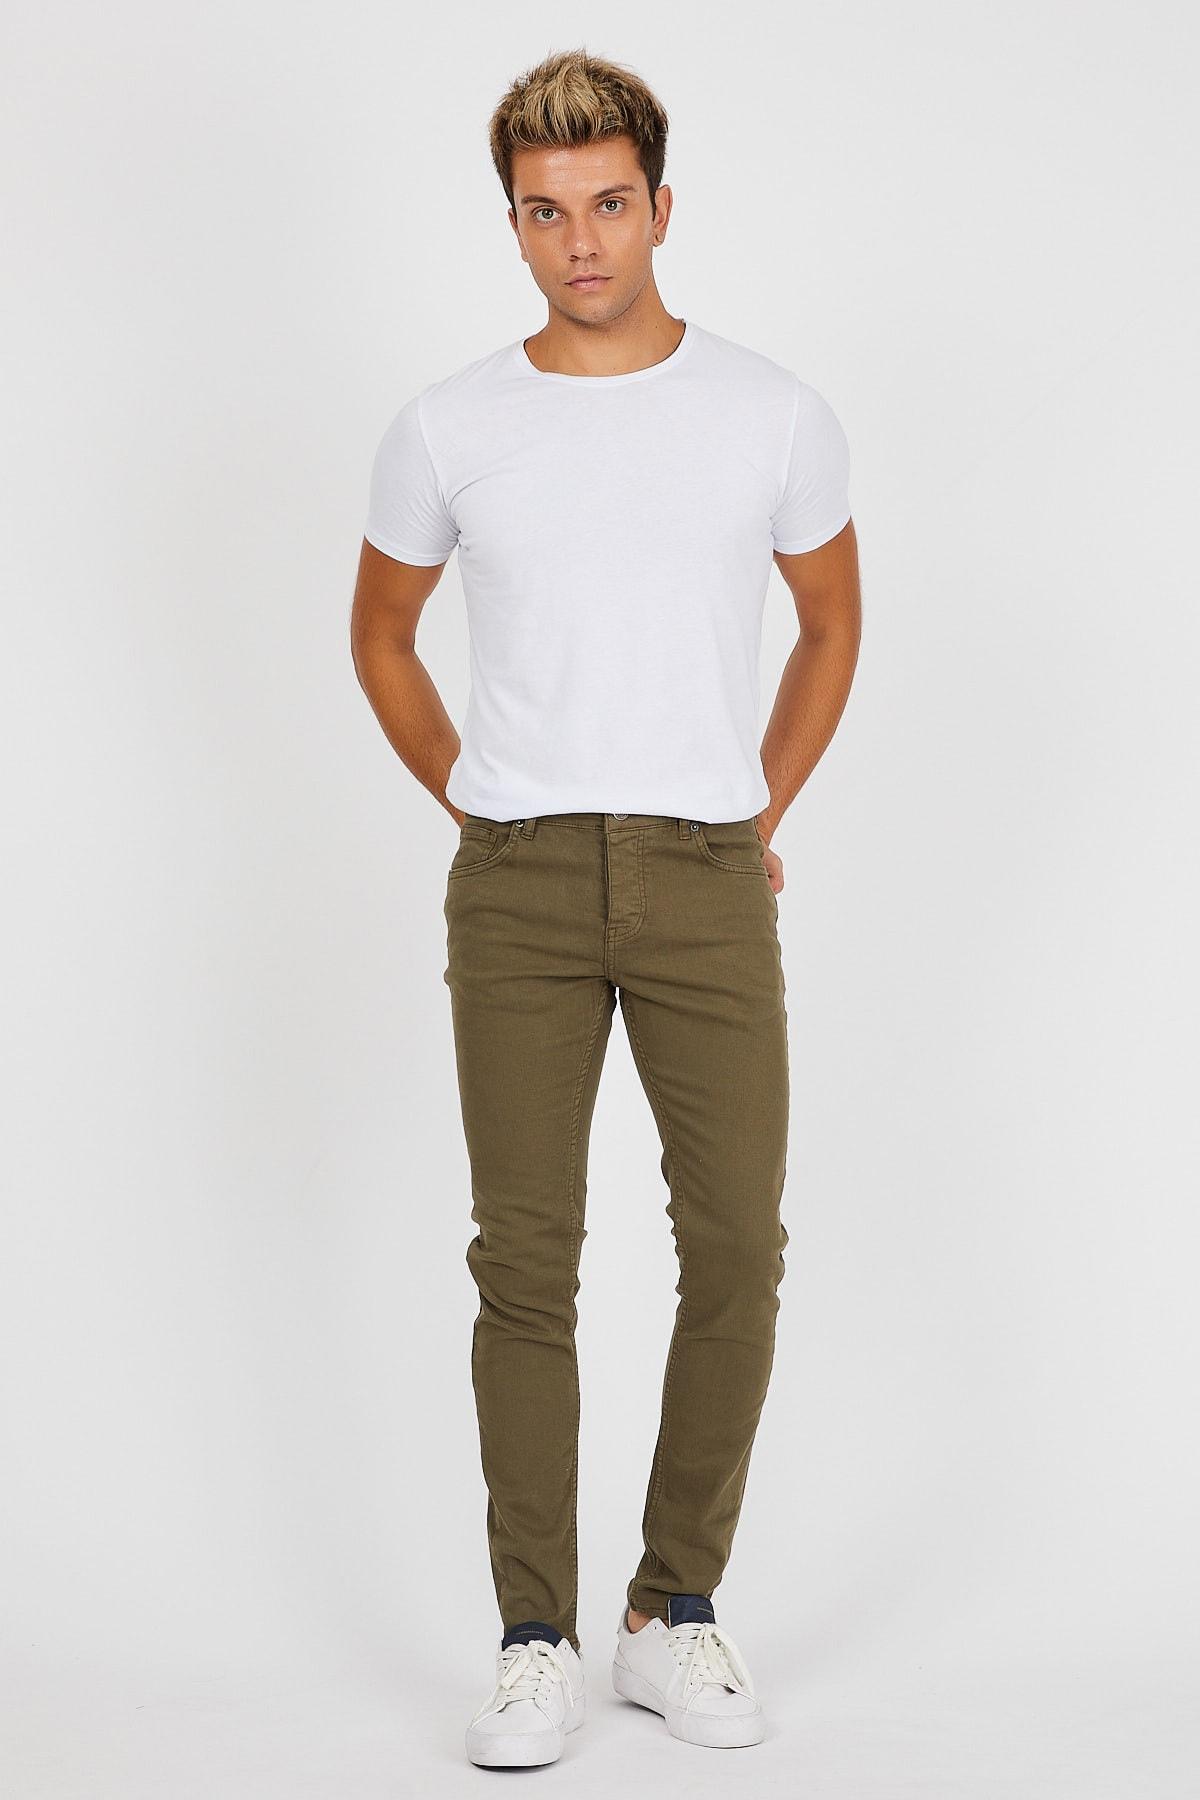 Denim Republic Erkek Haki Slim Fit Pantolon 2